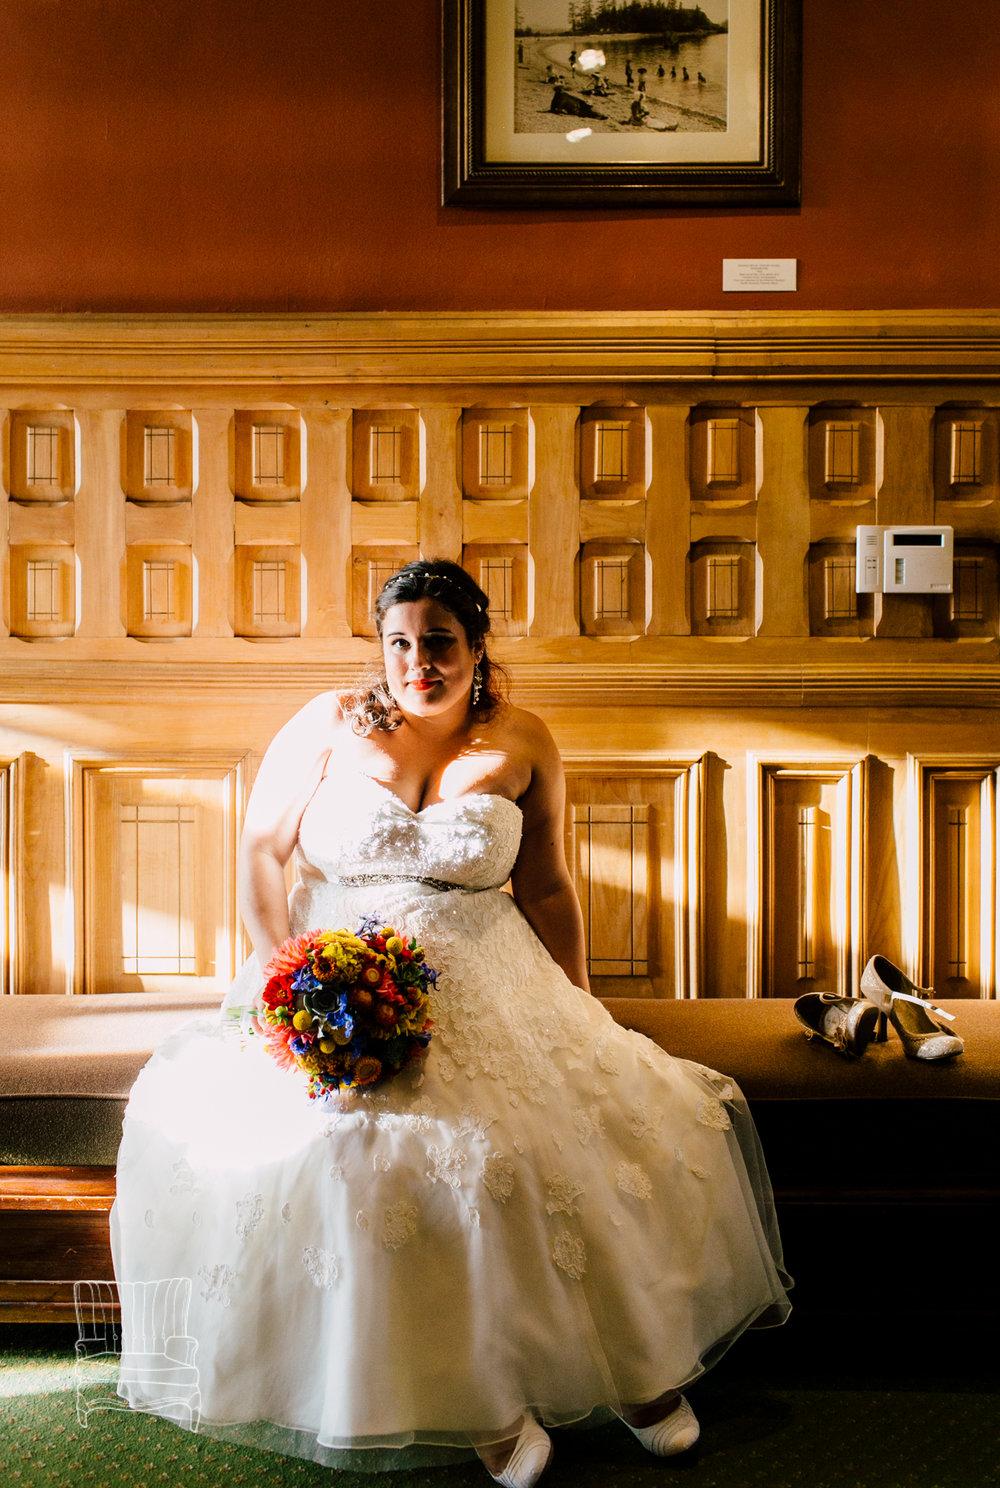 bellingham-whatcom-museum-wedding-katheryn-moran-photography-bribran-25.jpg